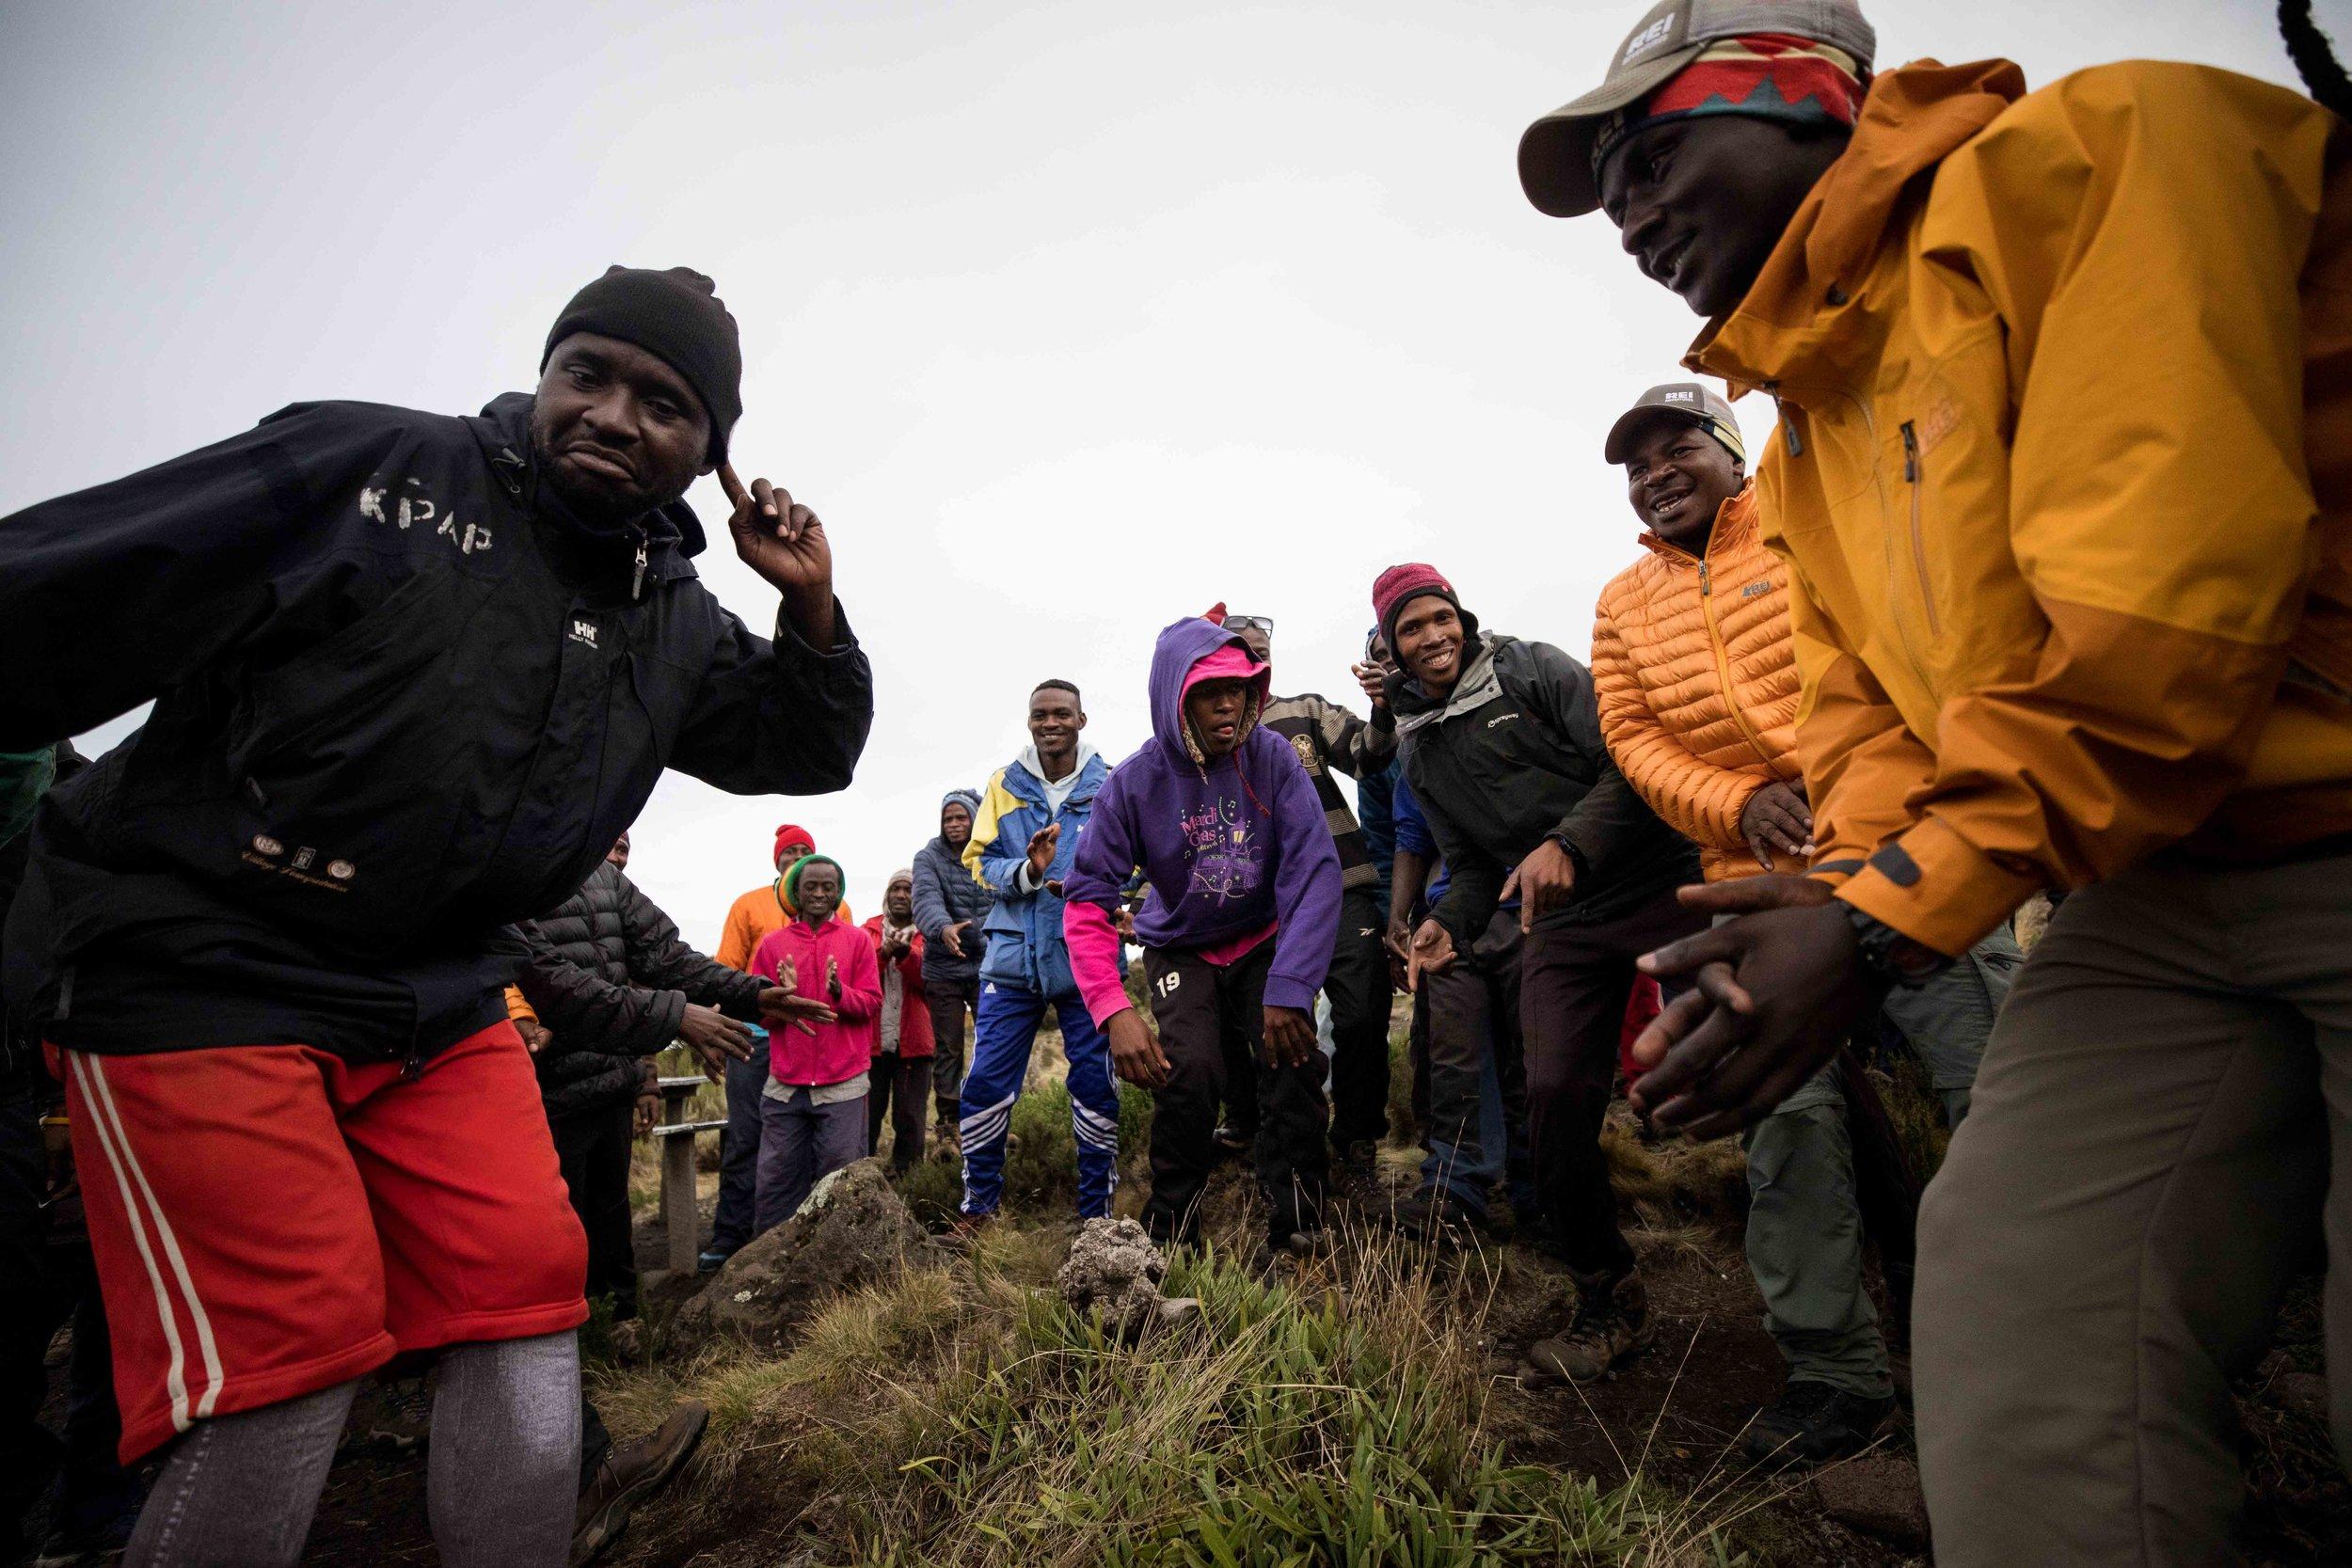 ajw_REI_Kilimanjaro-17.jpg